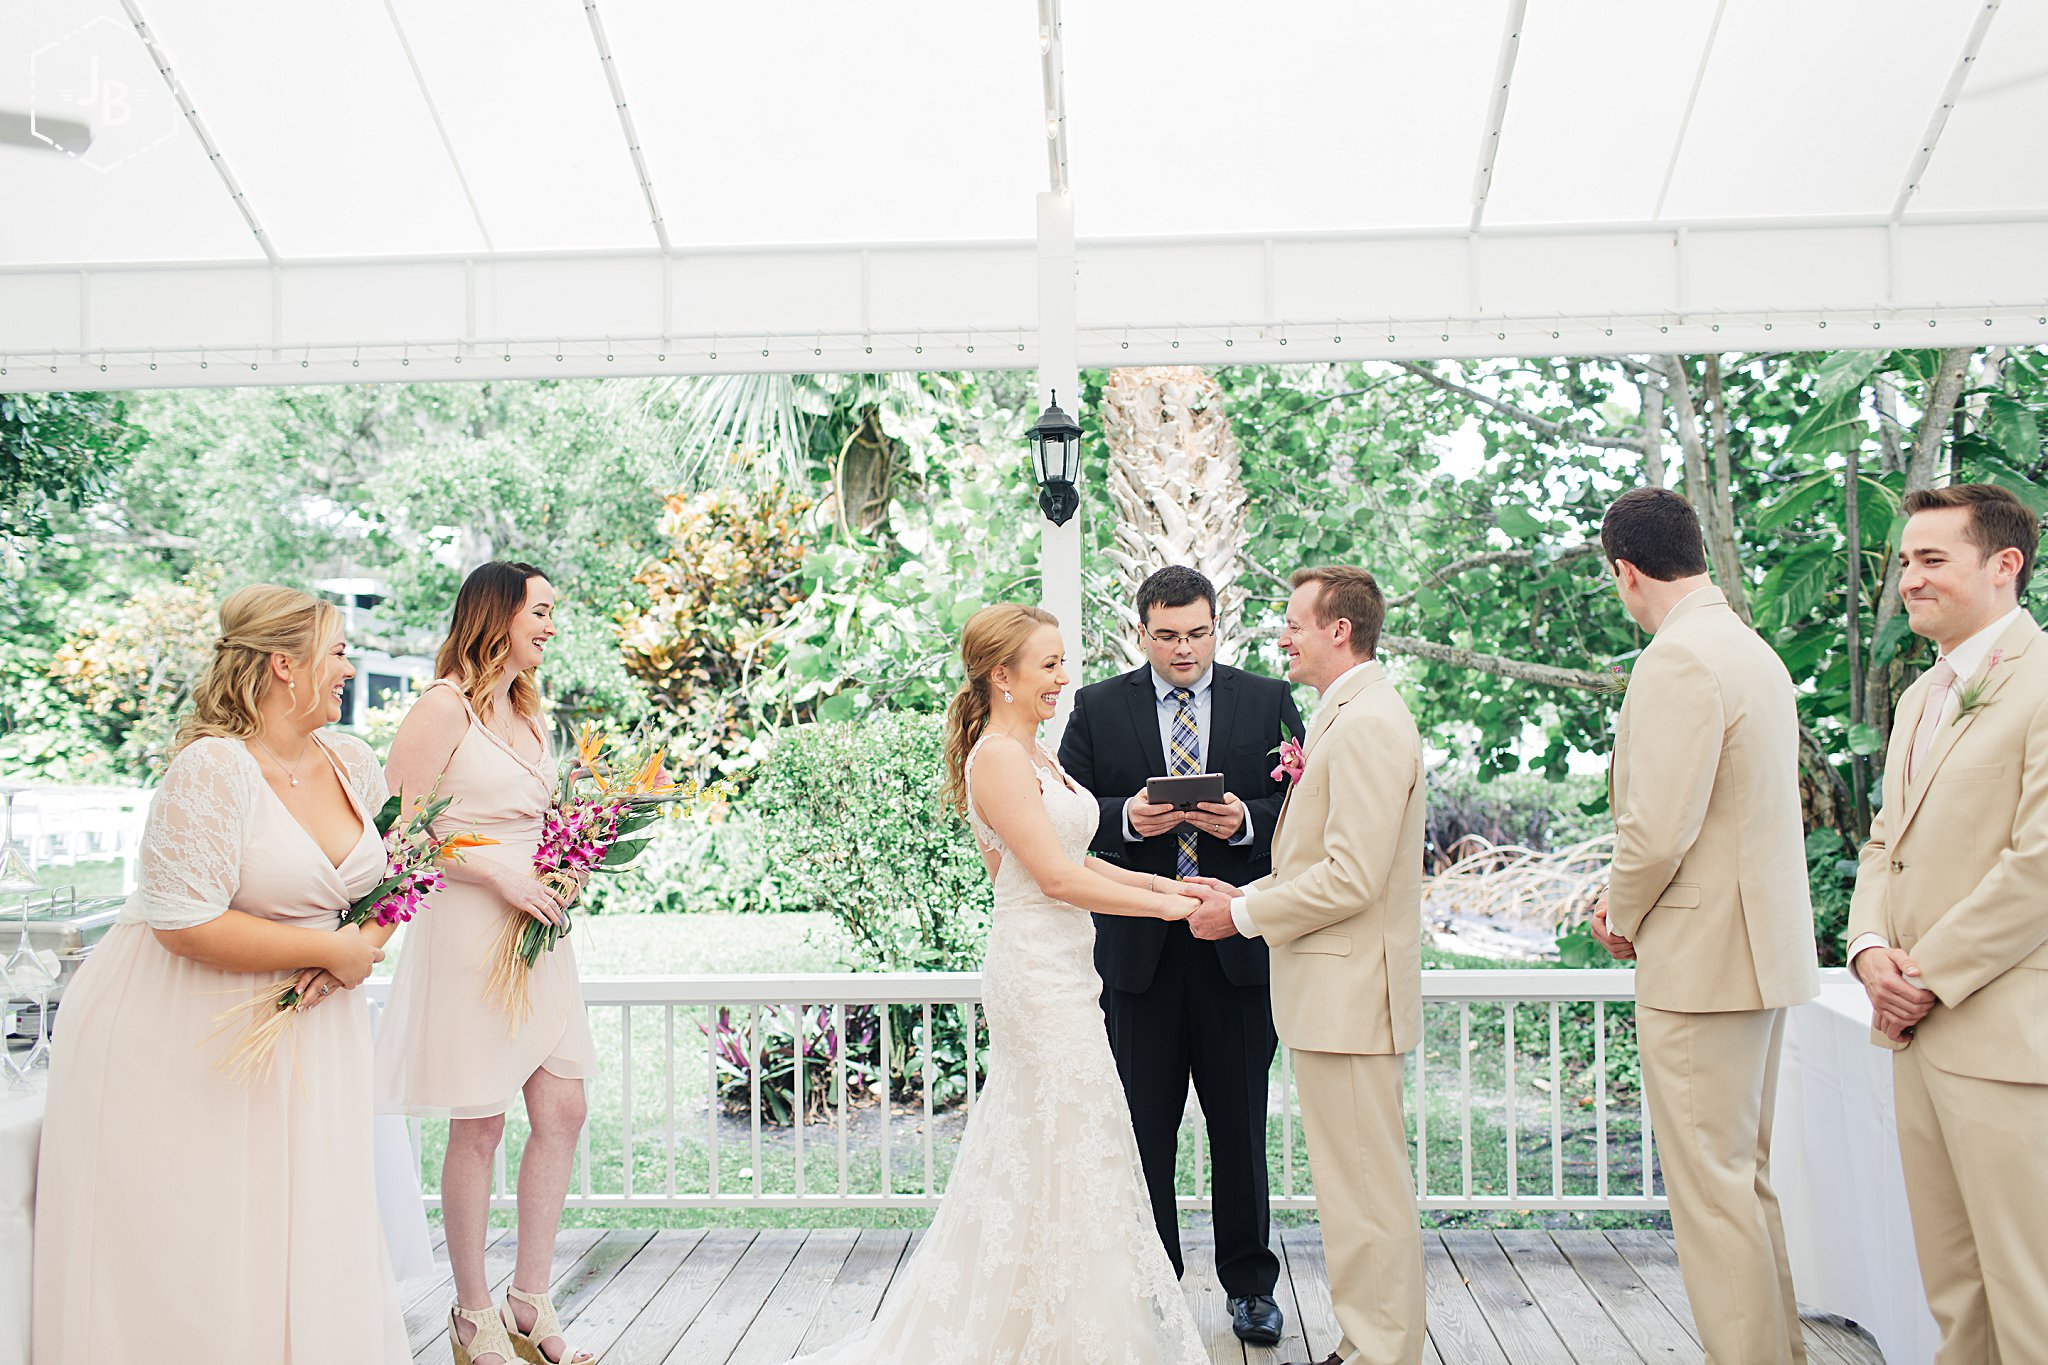 WeddingandEngagementFloridaPhotographer_2051.jpg